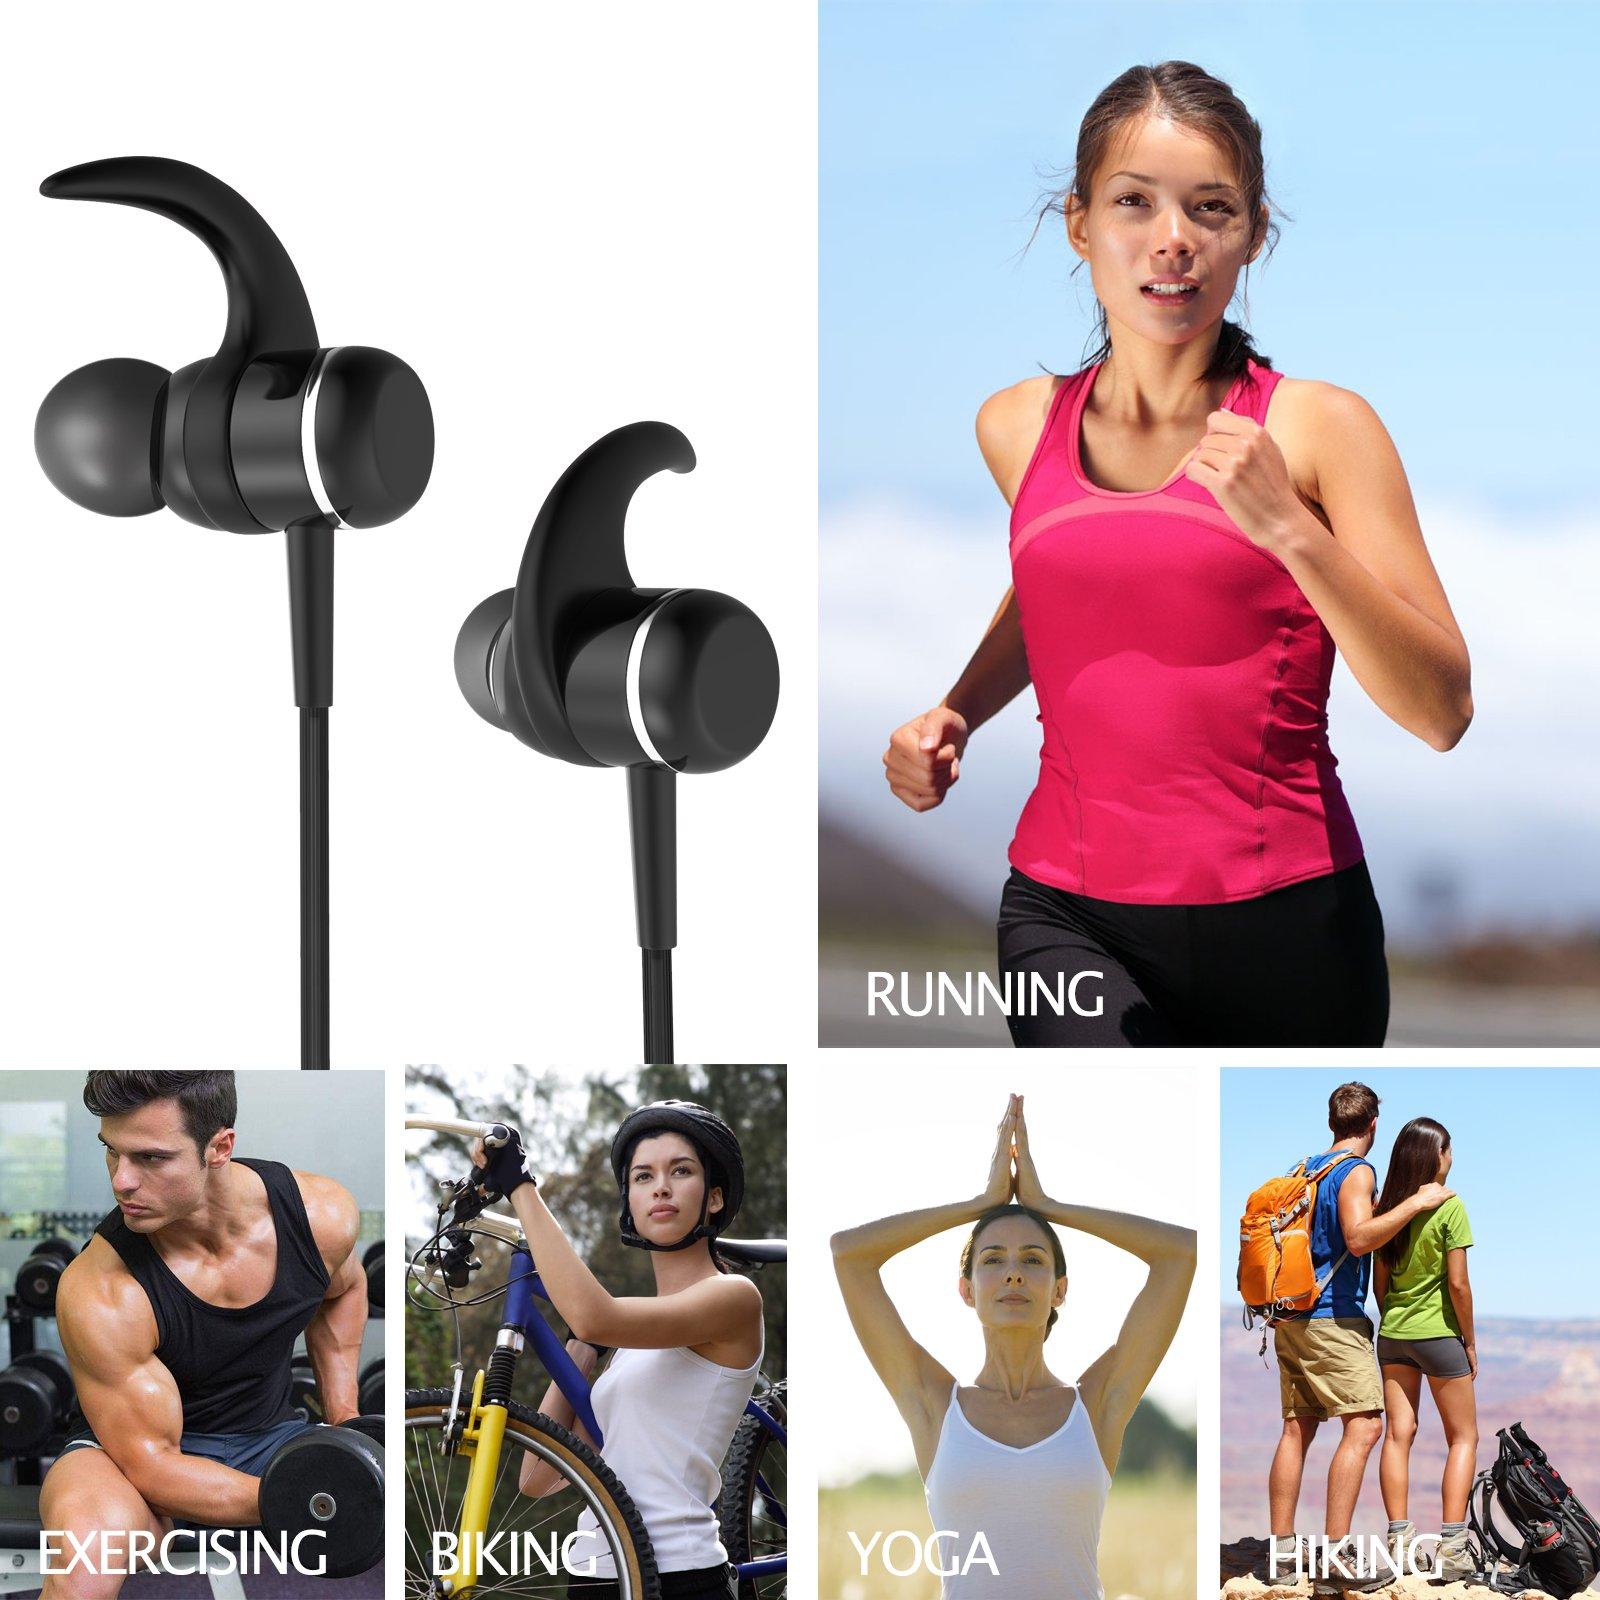 Bluetooth 4.1 Headphones, Sports Earphones w/Mic, Waterproof HD Stereo Earbuds for Gym Running by LIREION (Image #6)